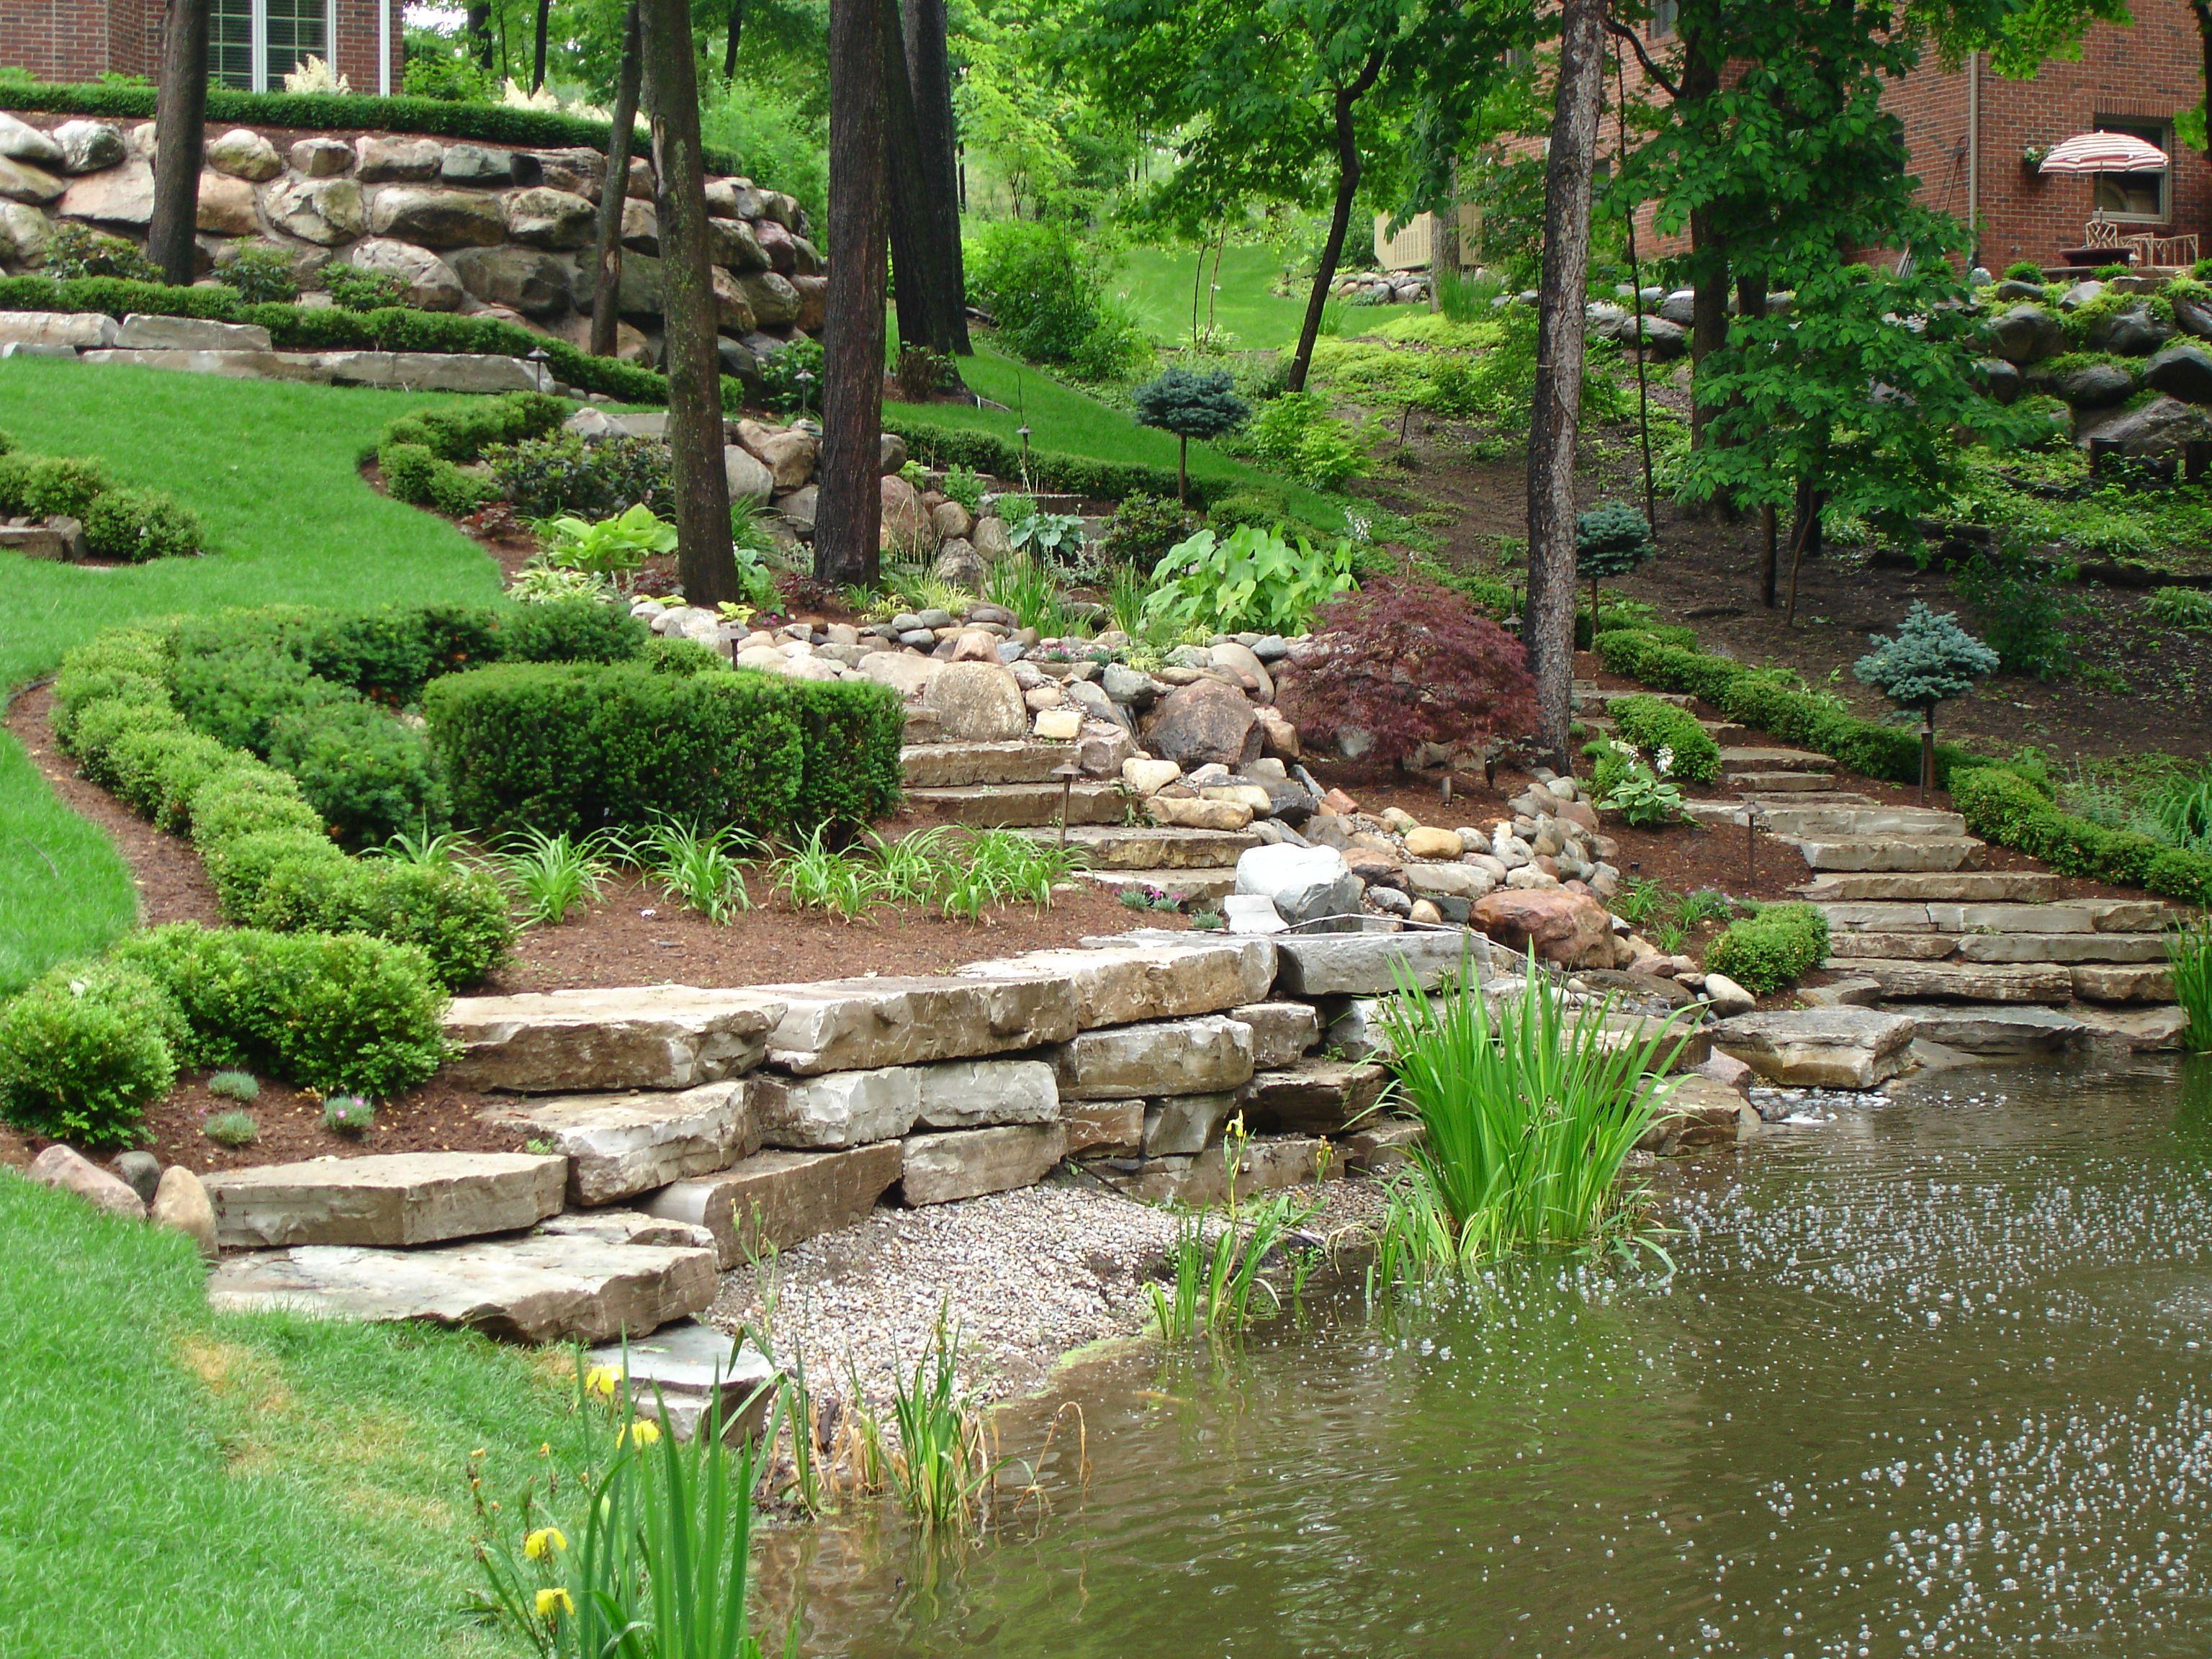 Backyard Landscaping Landscape Inspiration Landscape Ideas Diy Landscaping Popular Pin Gardening Large Backyard Landscaping Sloped Backyard Sloped Garden